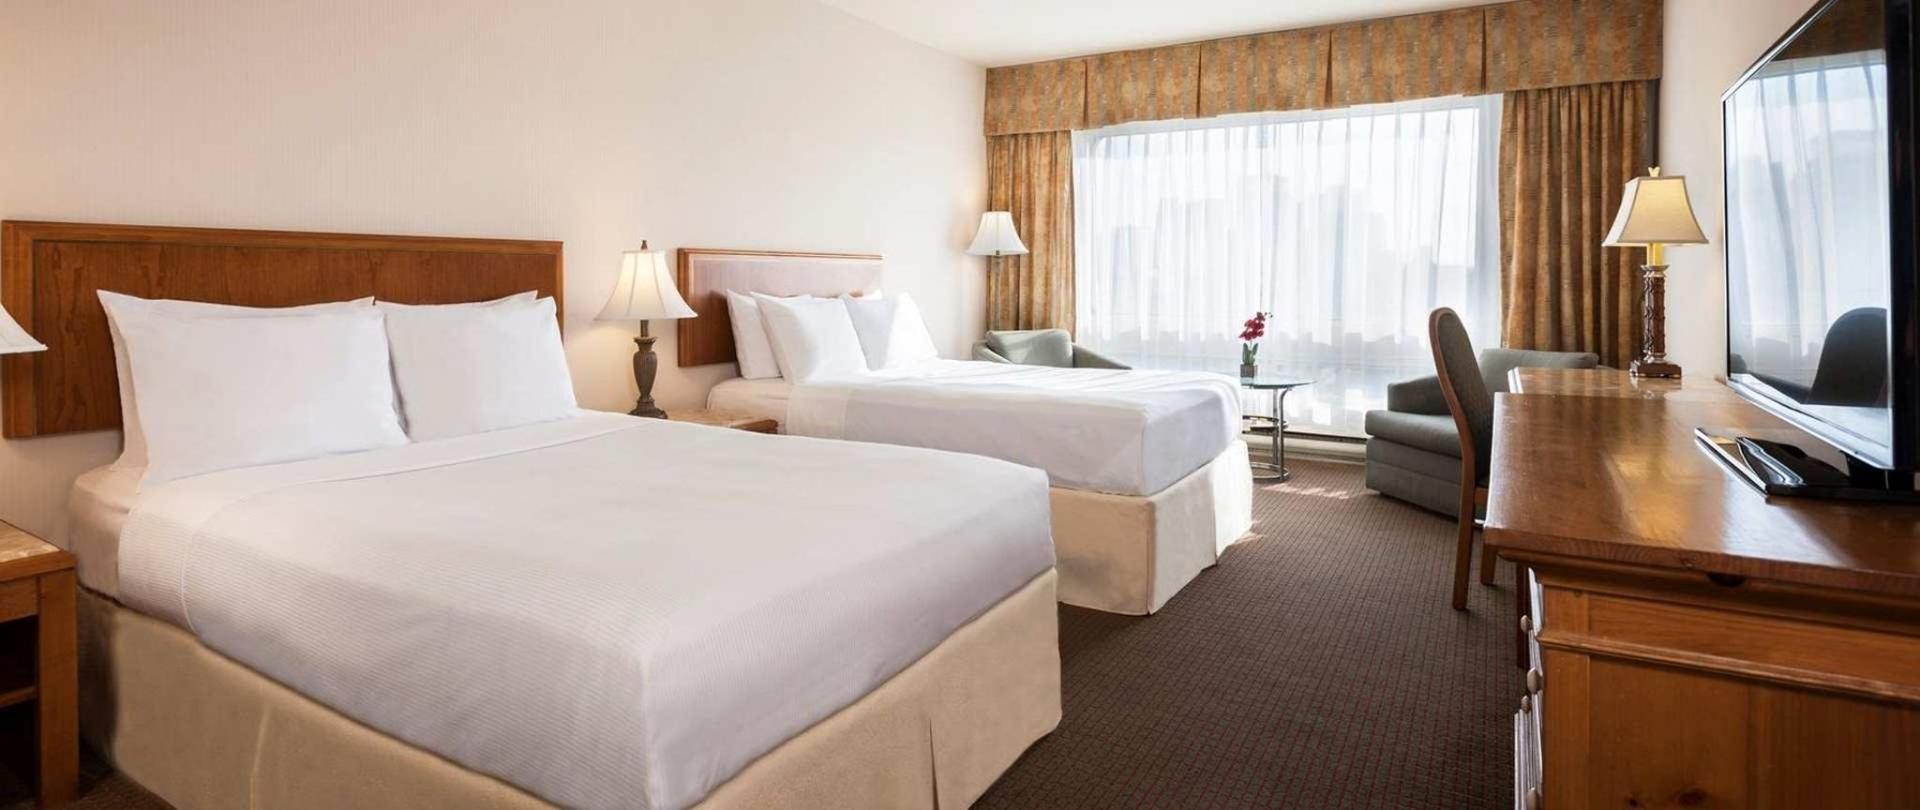 hotels_gouverneur_montreal_04_chambre-reguliere_double.jpg.1920x810_129_417_10960.jpeg